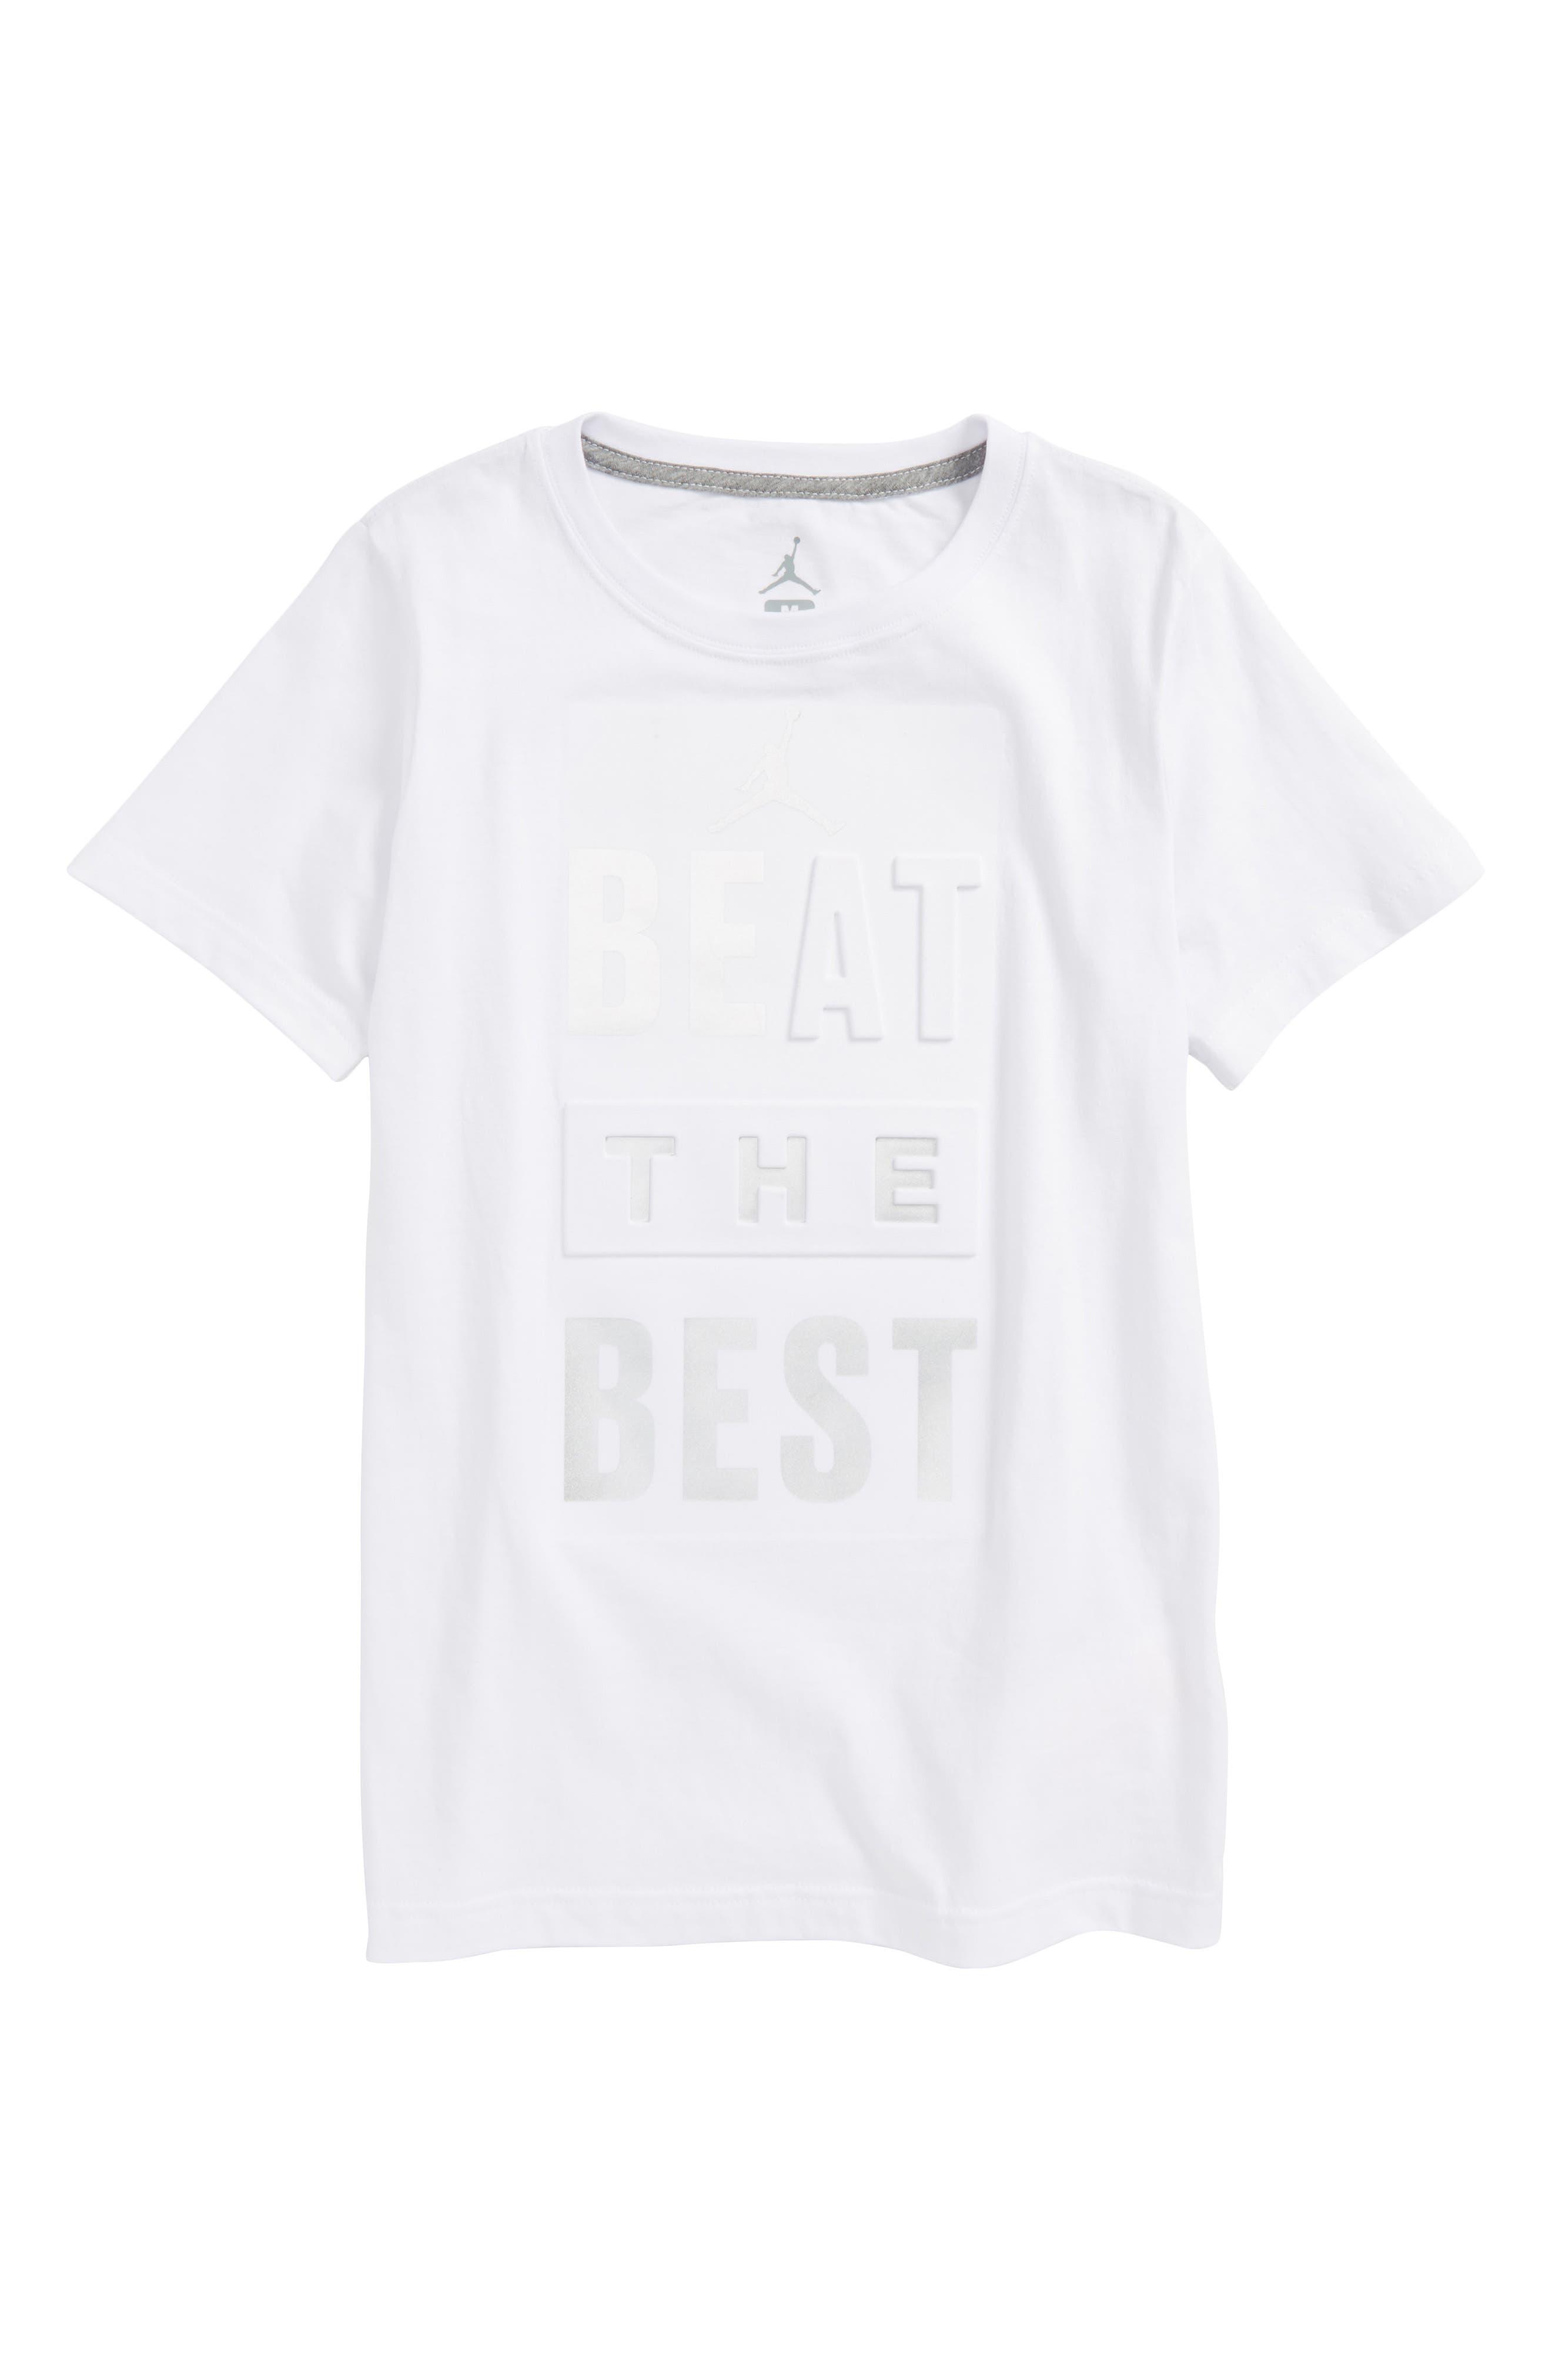 Main Image - Jordan Beat the Best Graphic T-Shirt (Big Boys)